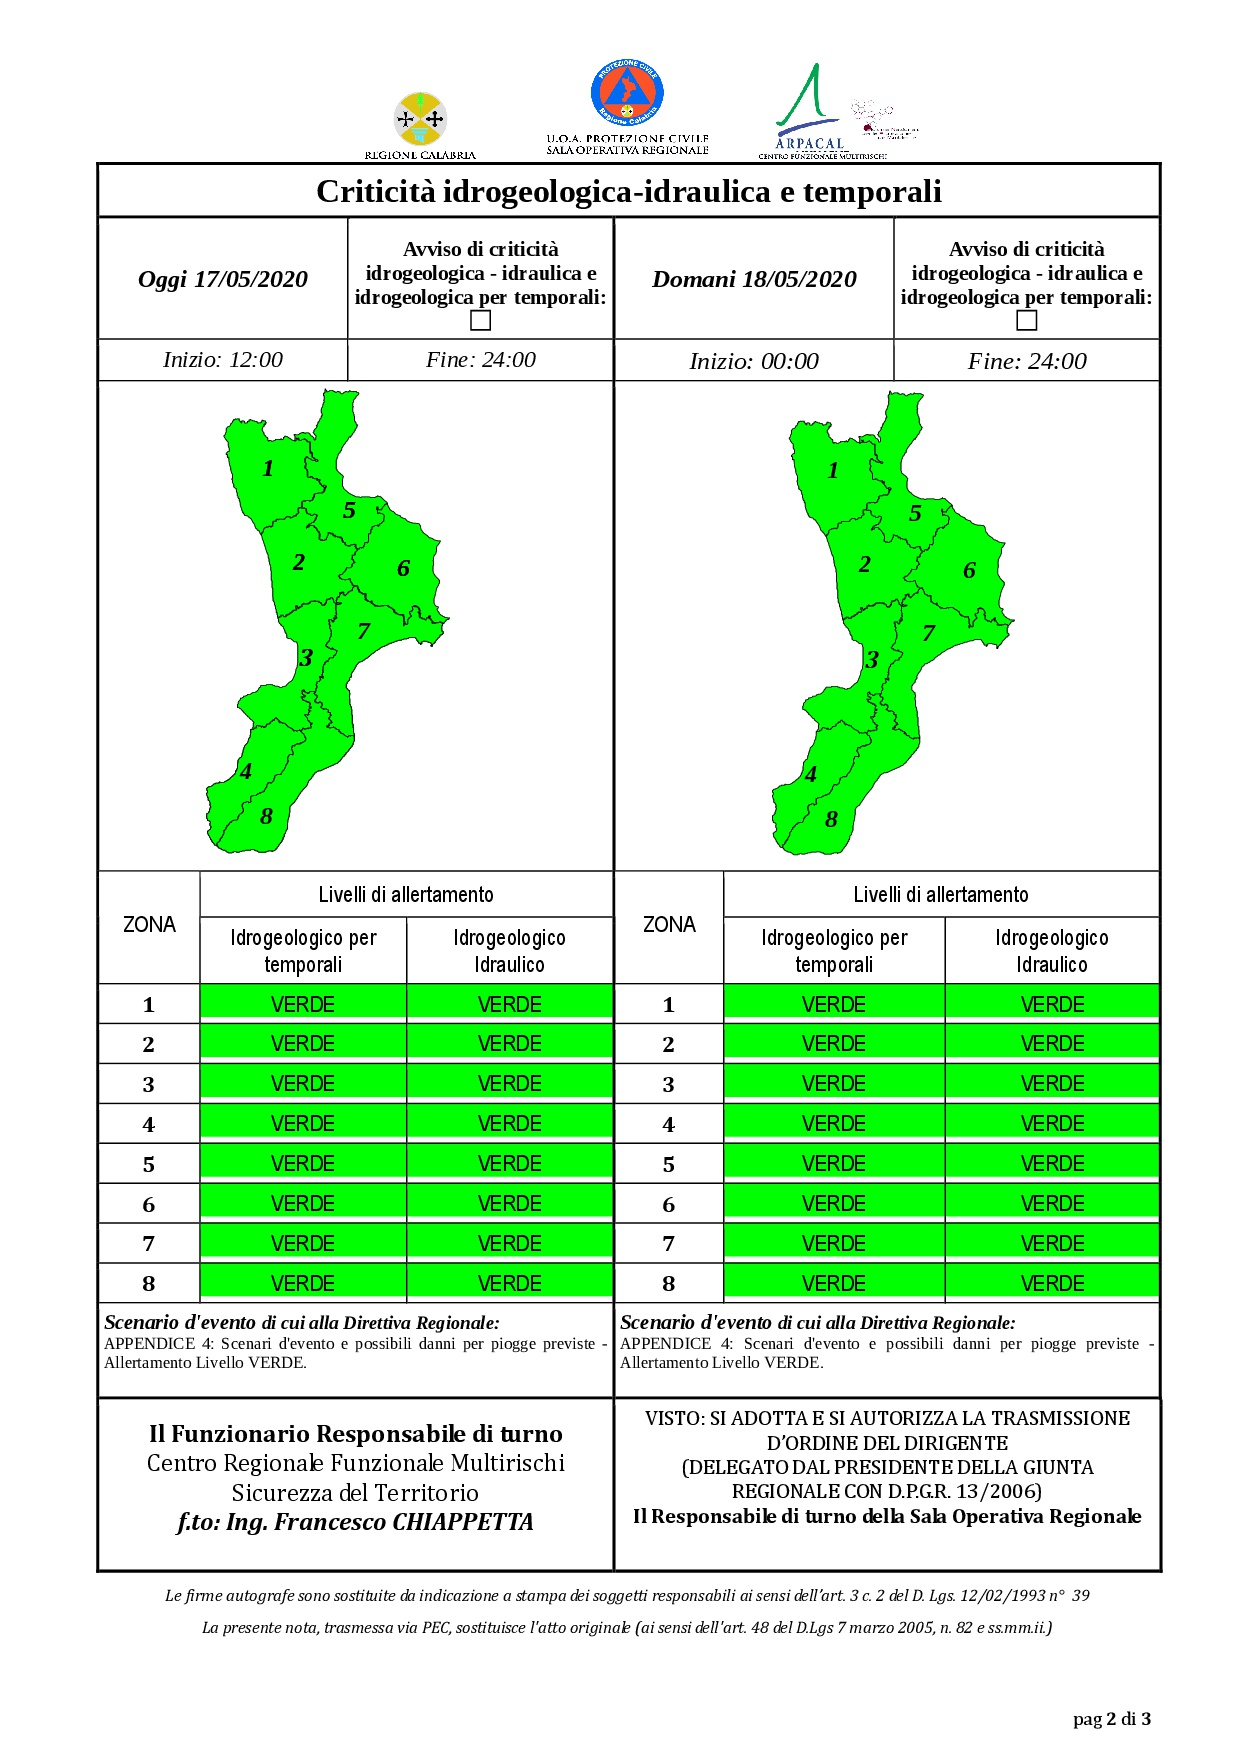 Criticità idrogeologica-idraulica e temporali in Calabria 17-05-2020